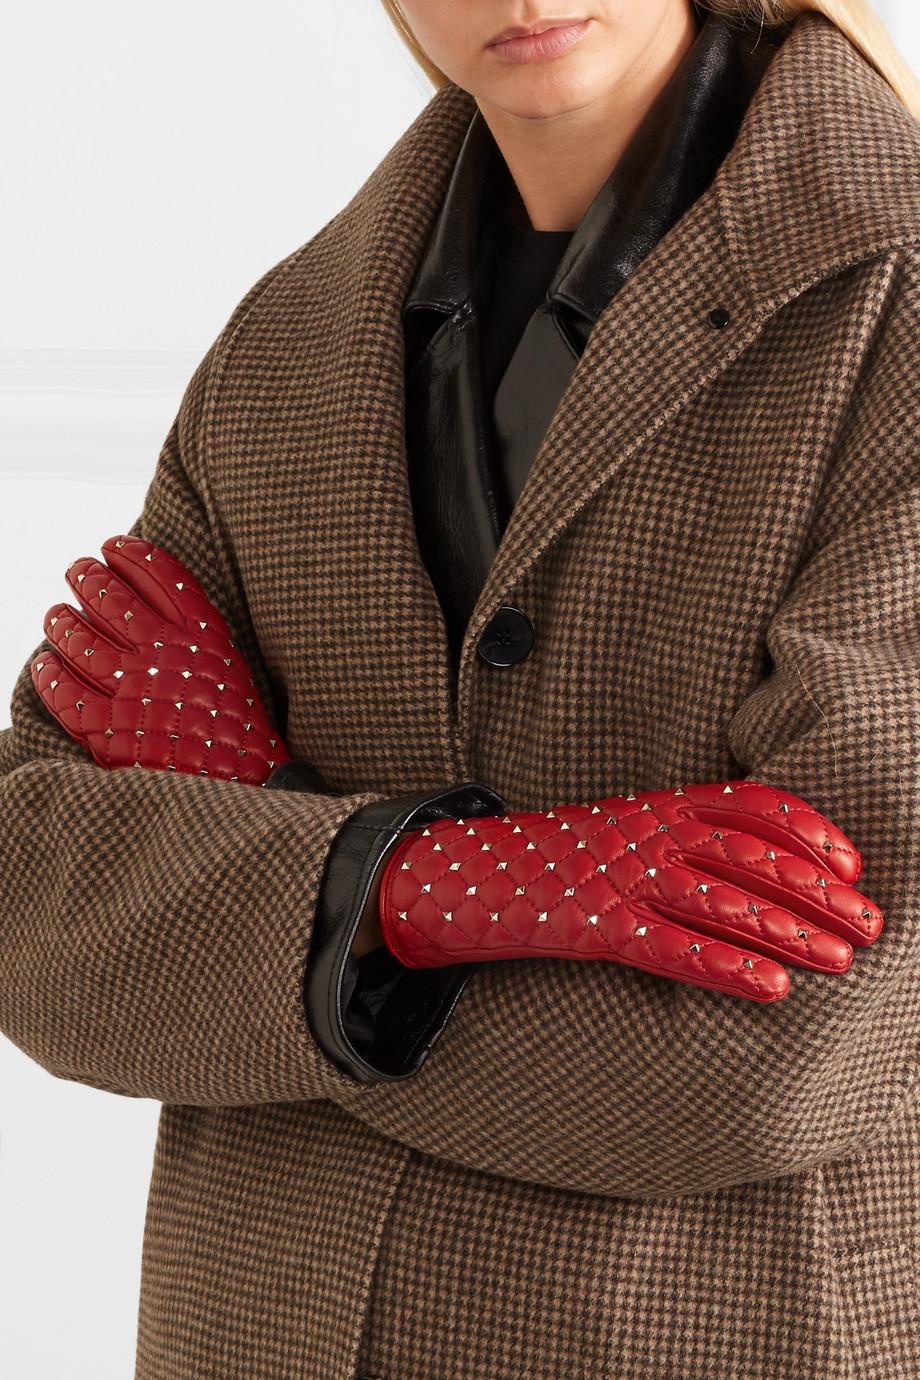 Valentino Valentino Garavani The Rockstud leather gloves $695